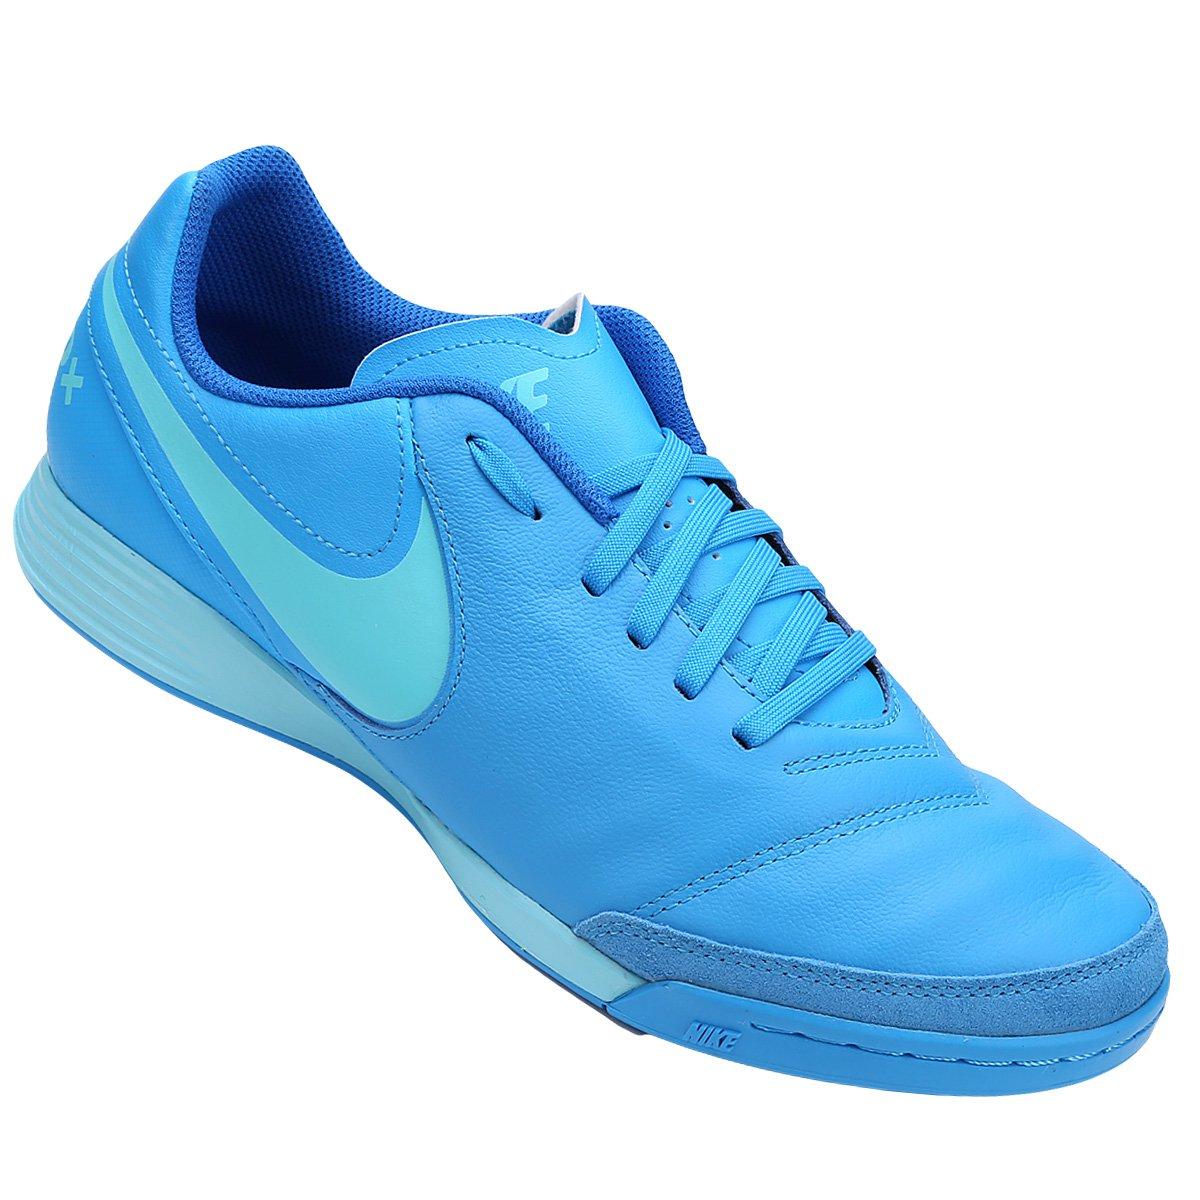 Chuteira Futsal Nike Tiempo Genio 2 Leather IC - Compre Agora  873e1667ff37e